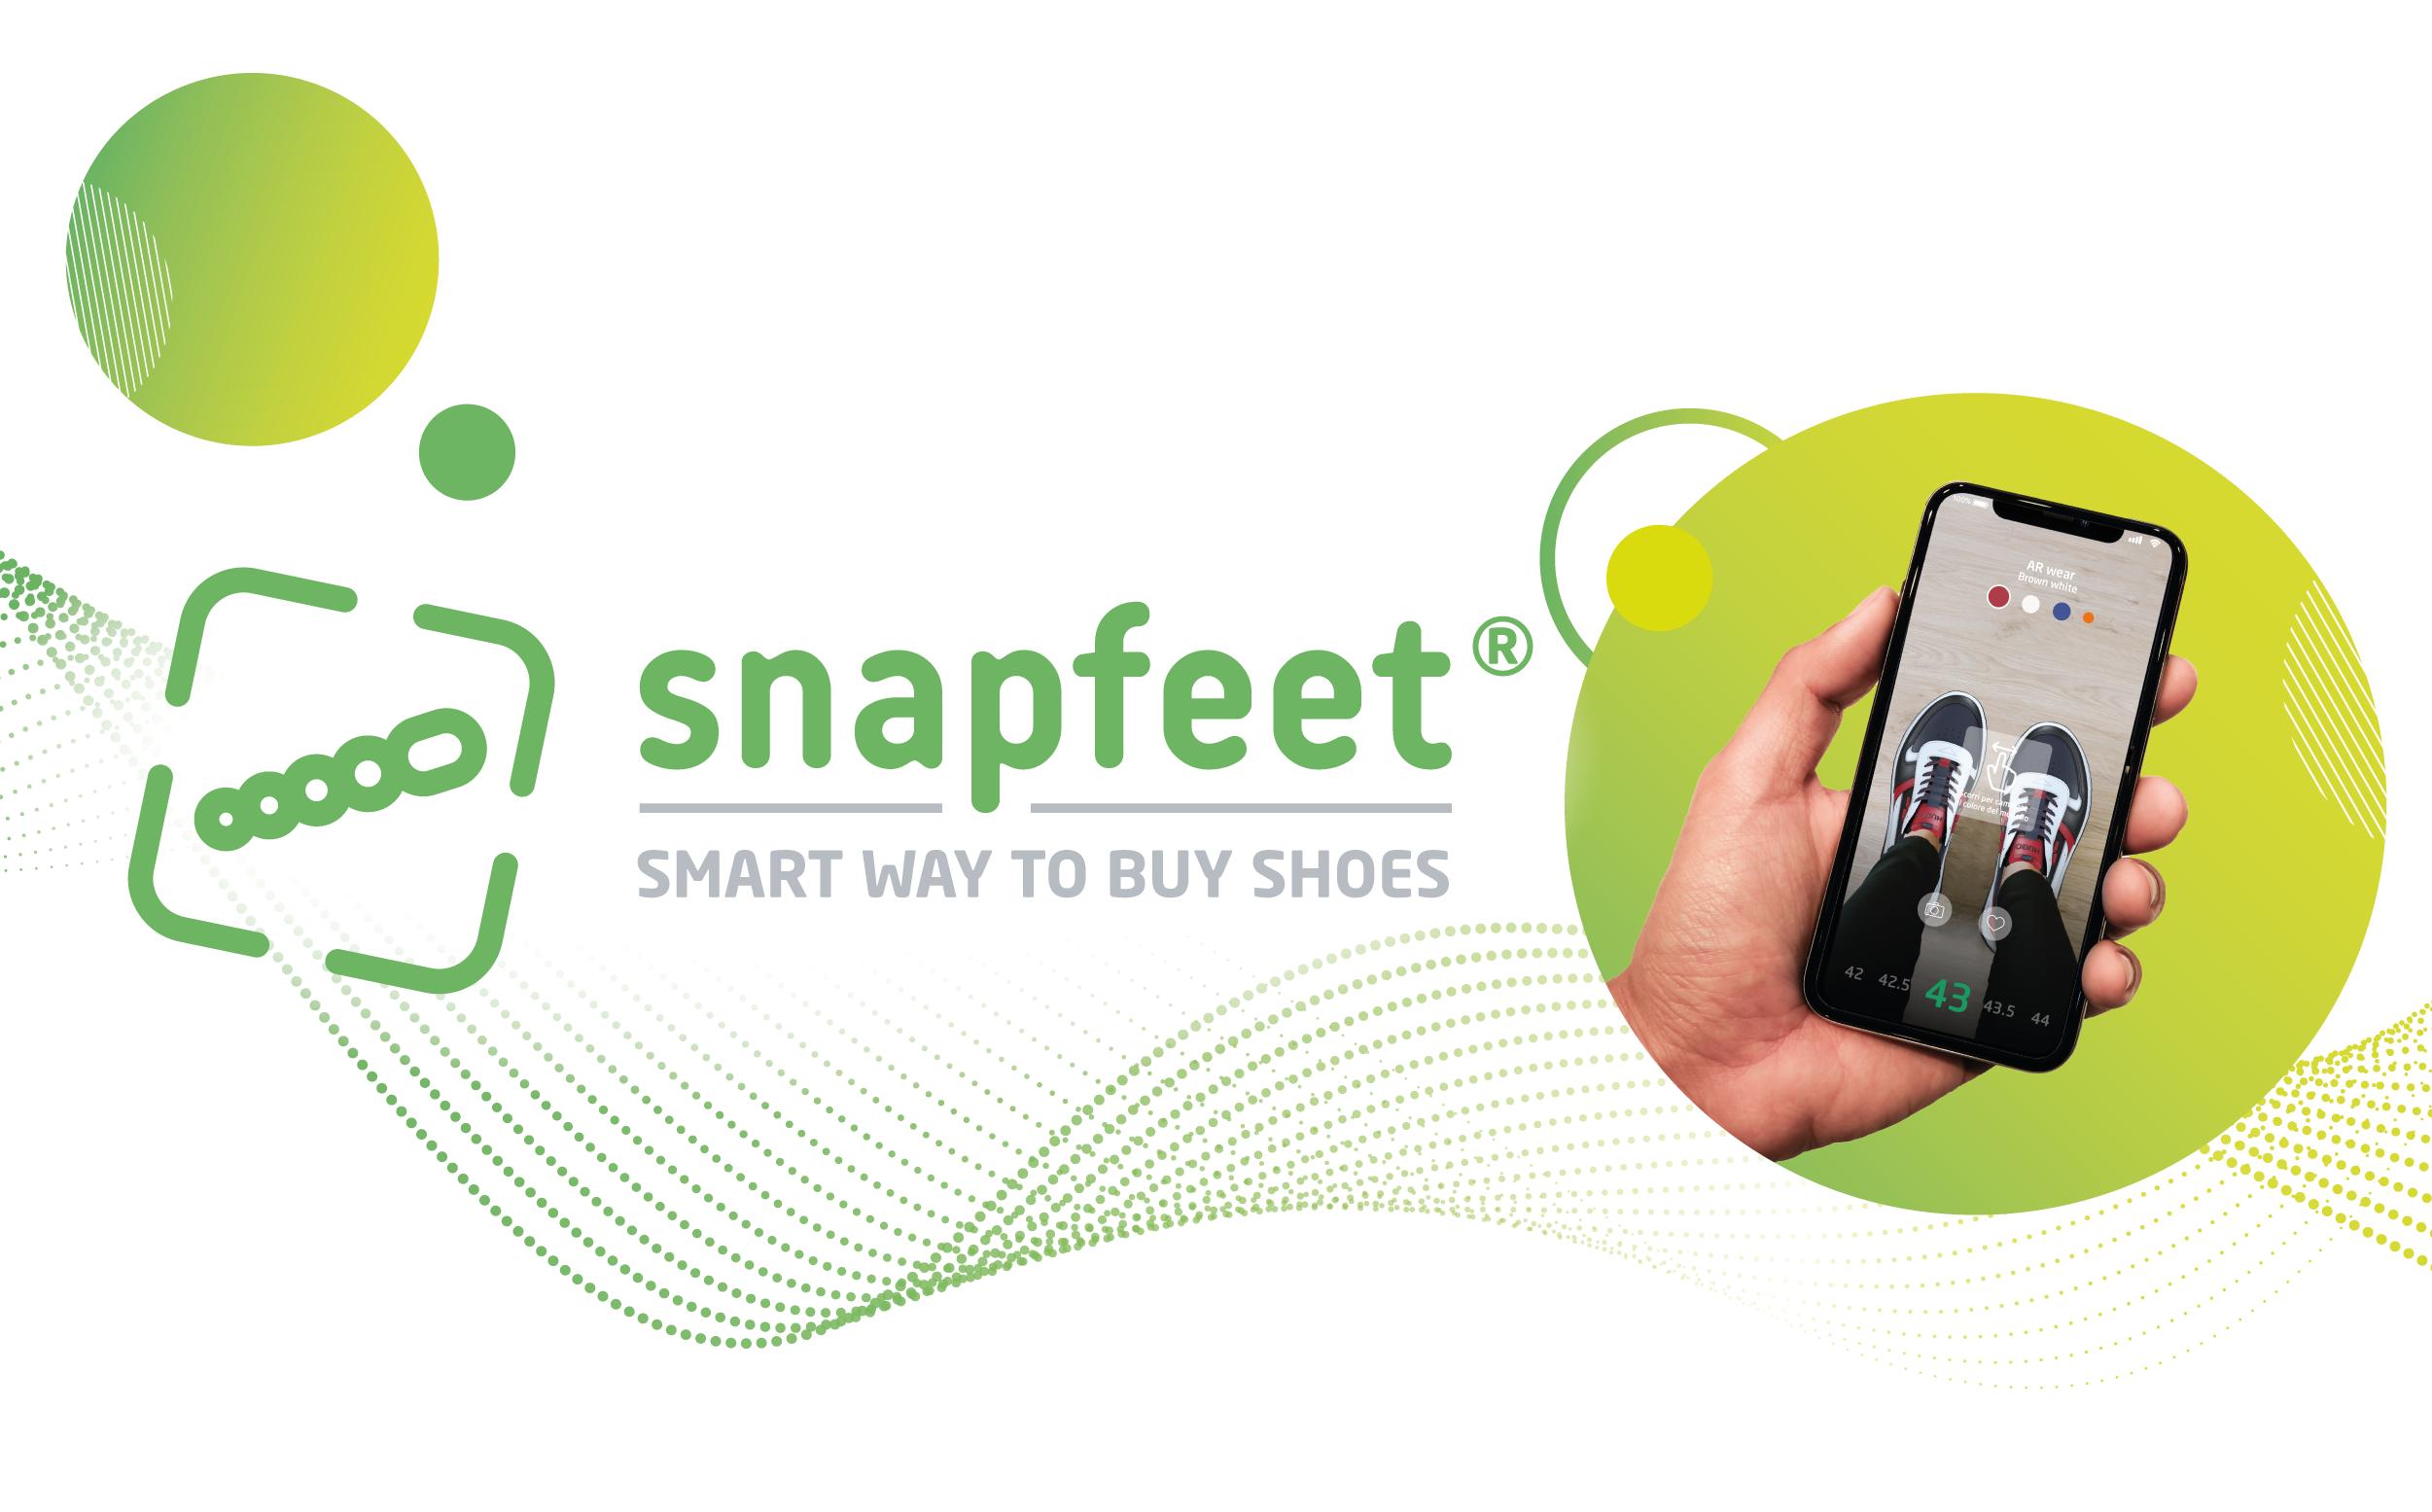 Snapfeet mobile